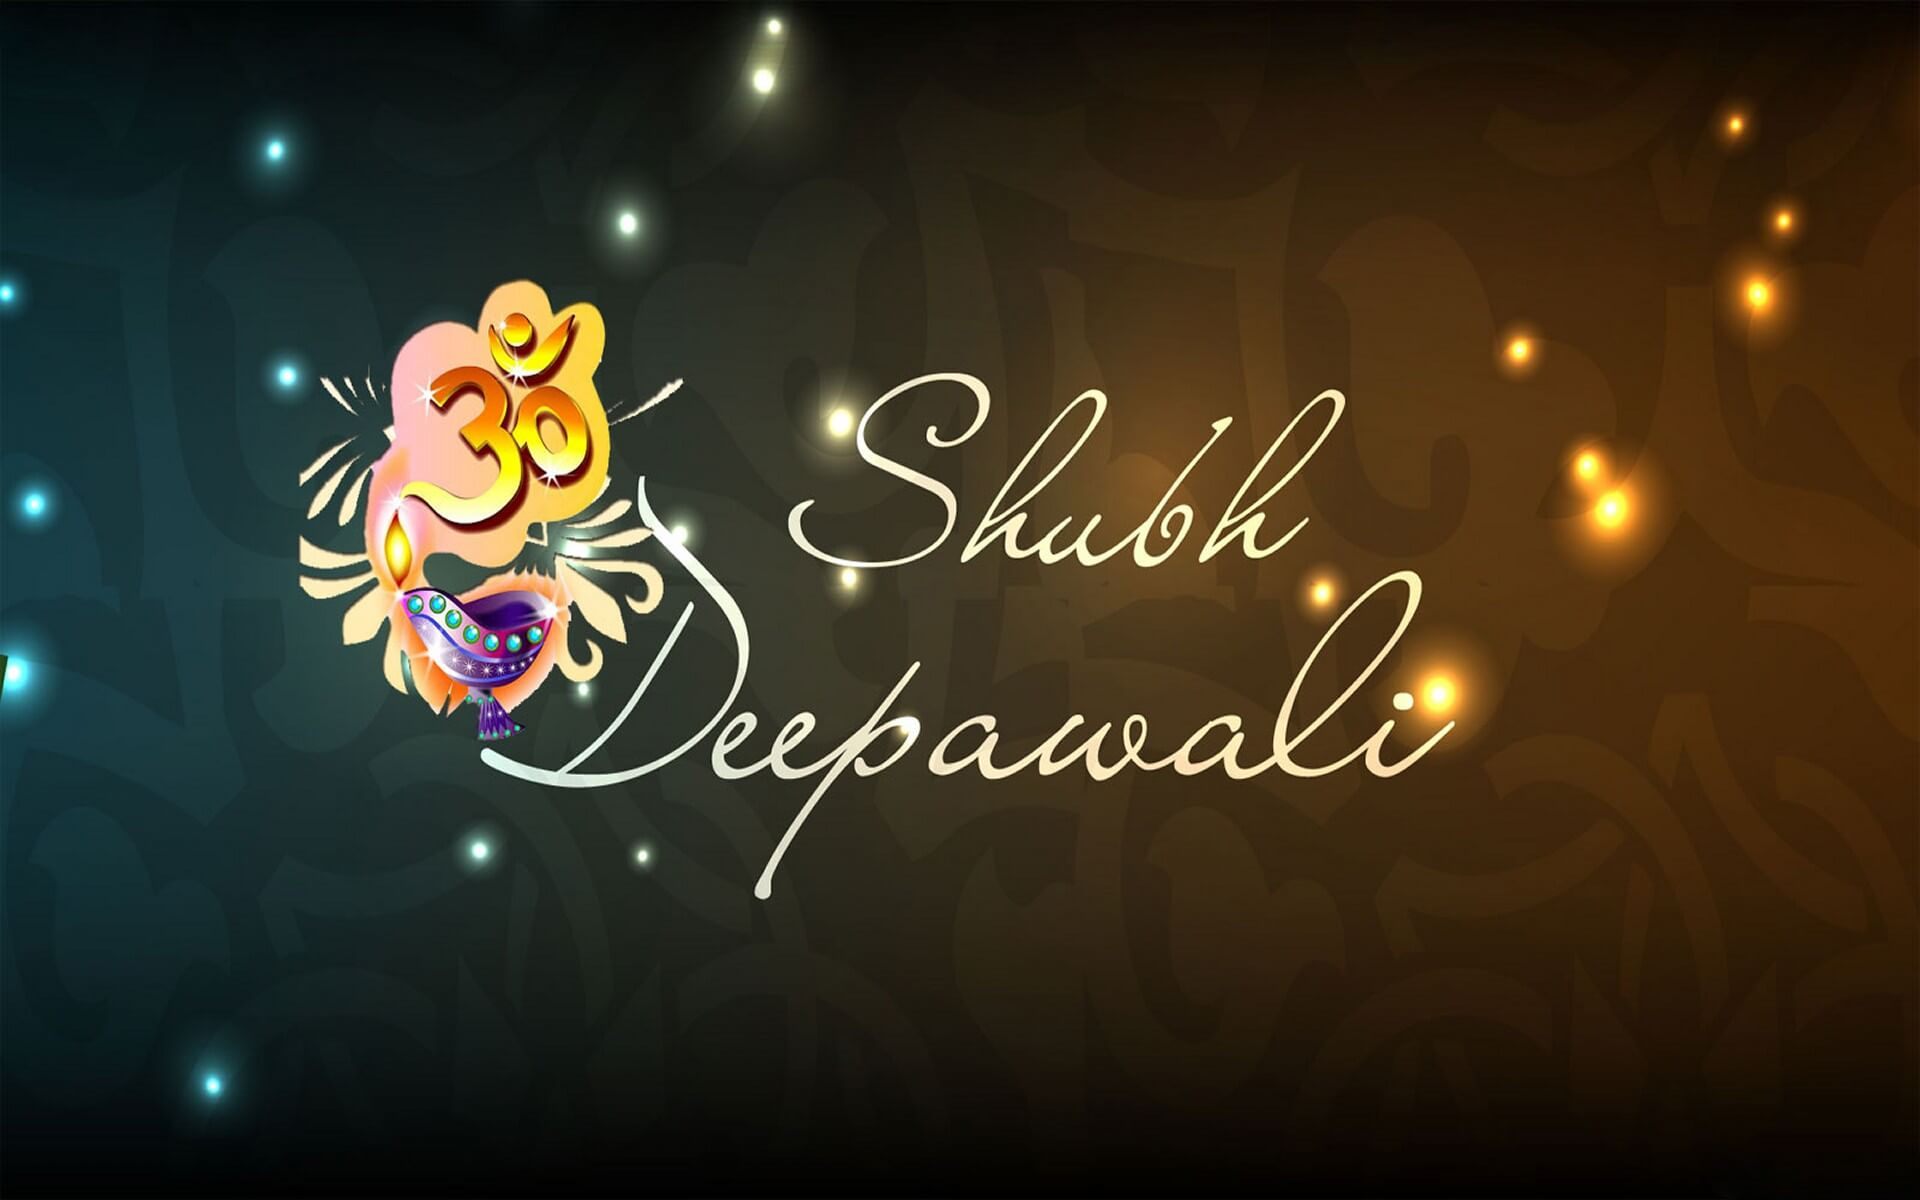 shubh diwali hd wallpaper images greeting card